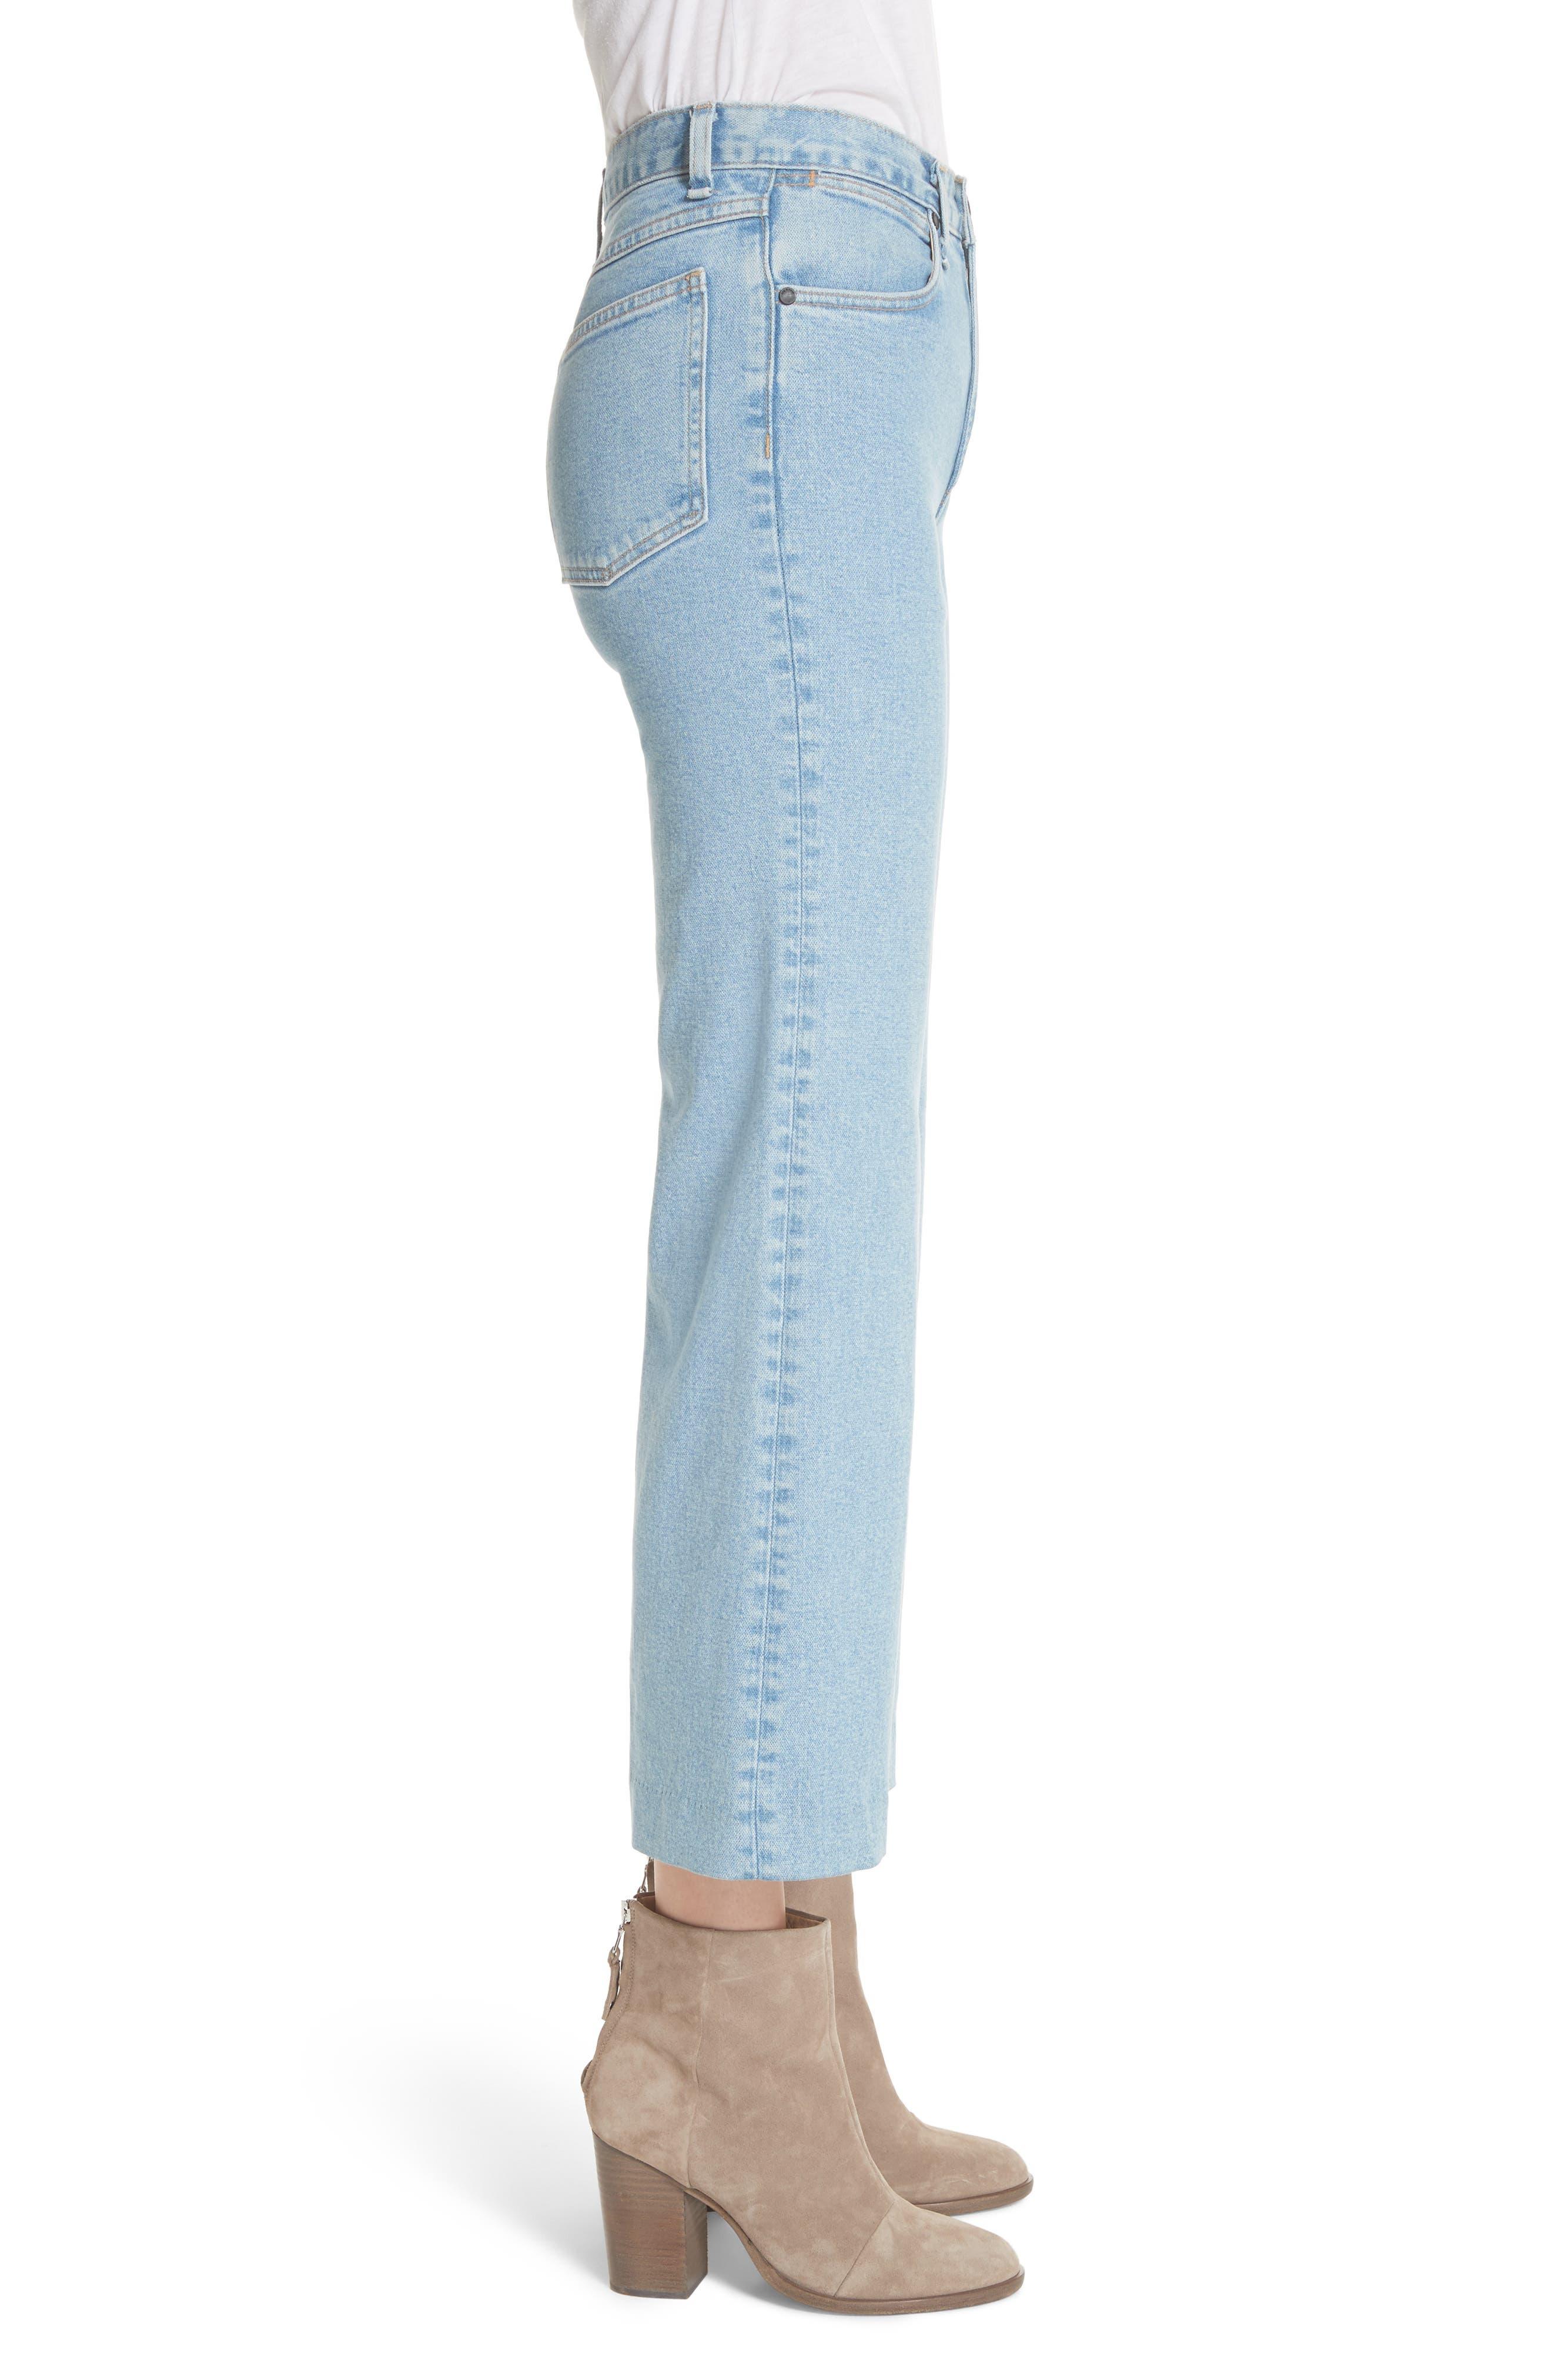 Justine High Waist Wide Leg Trouser Jeans,                             Alternate thumbnail 3, color,                             450